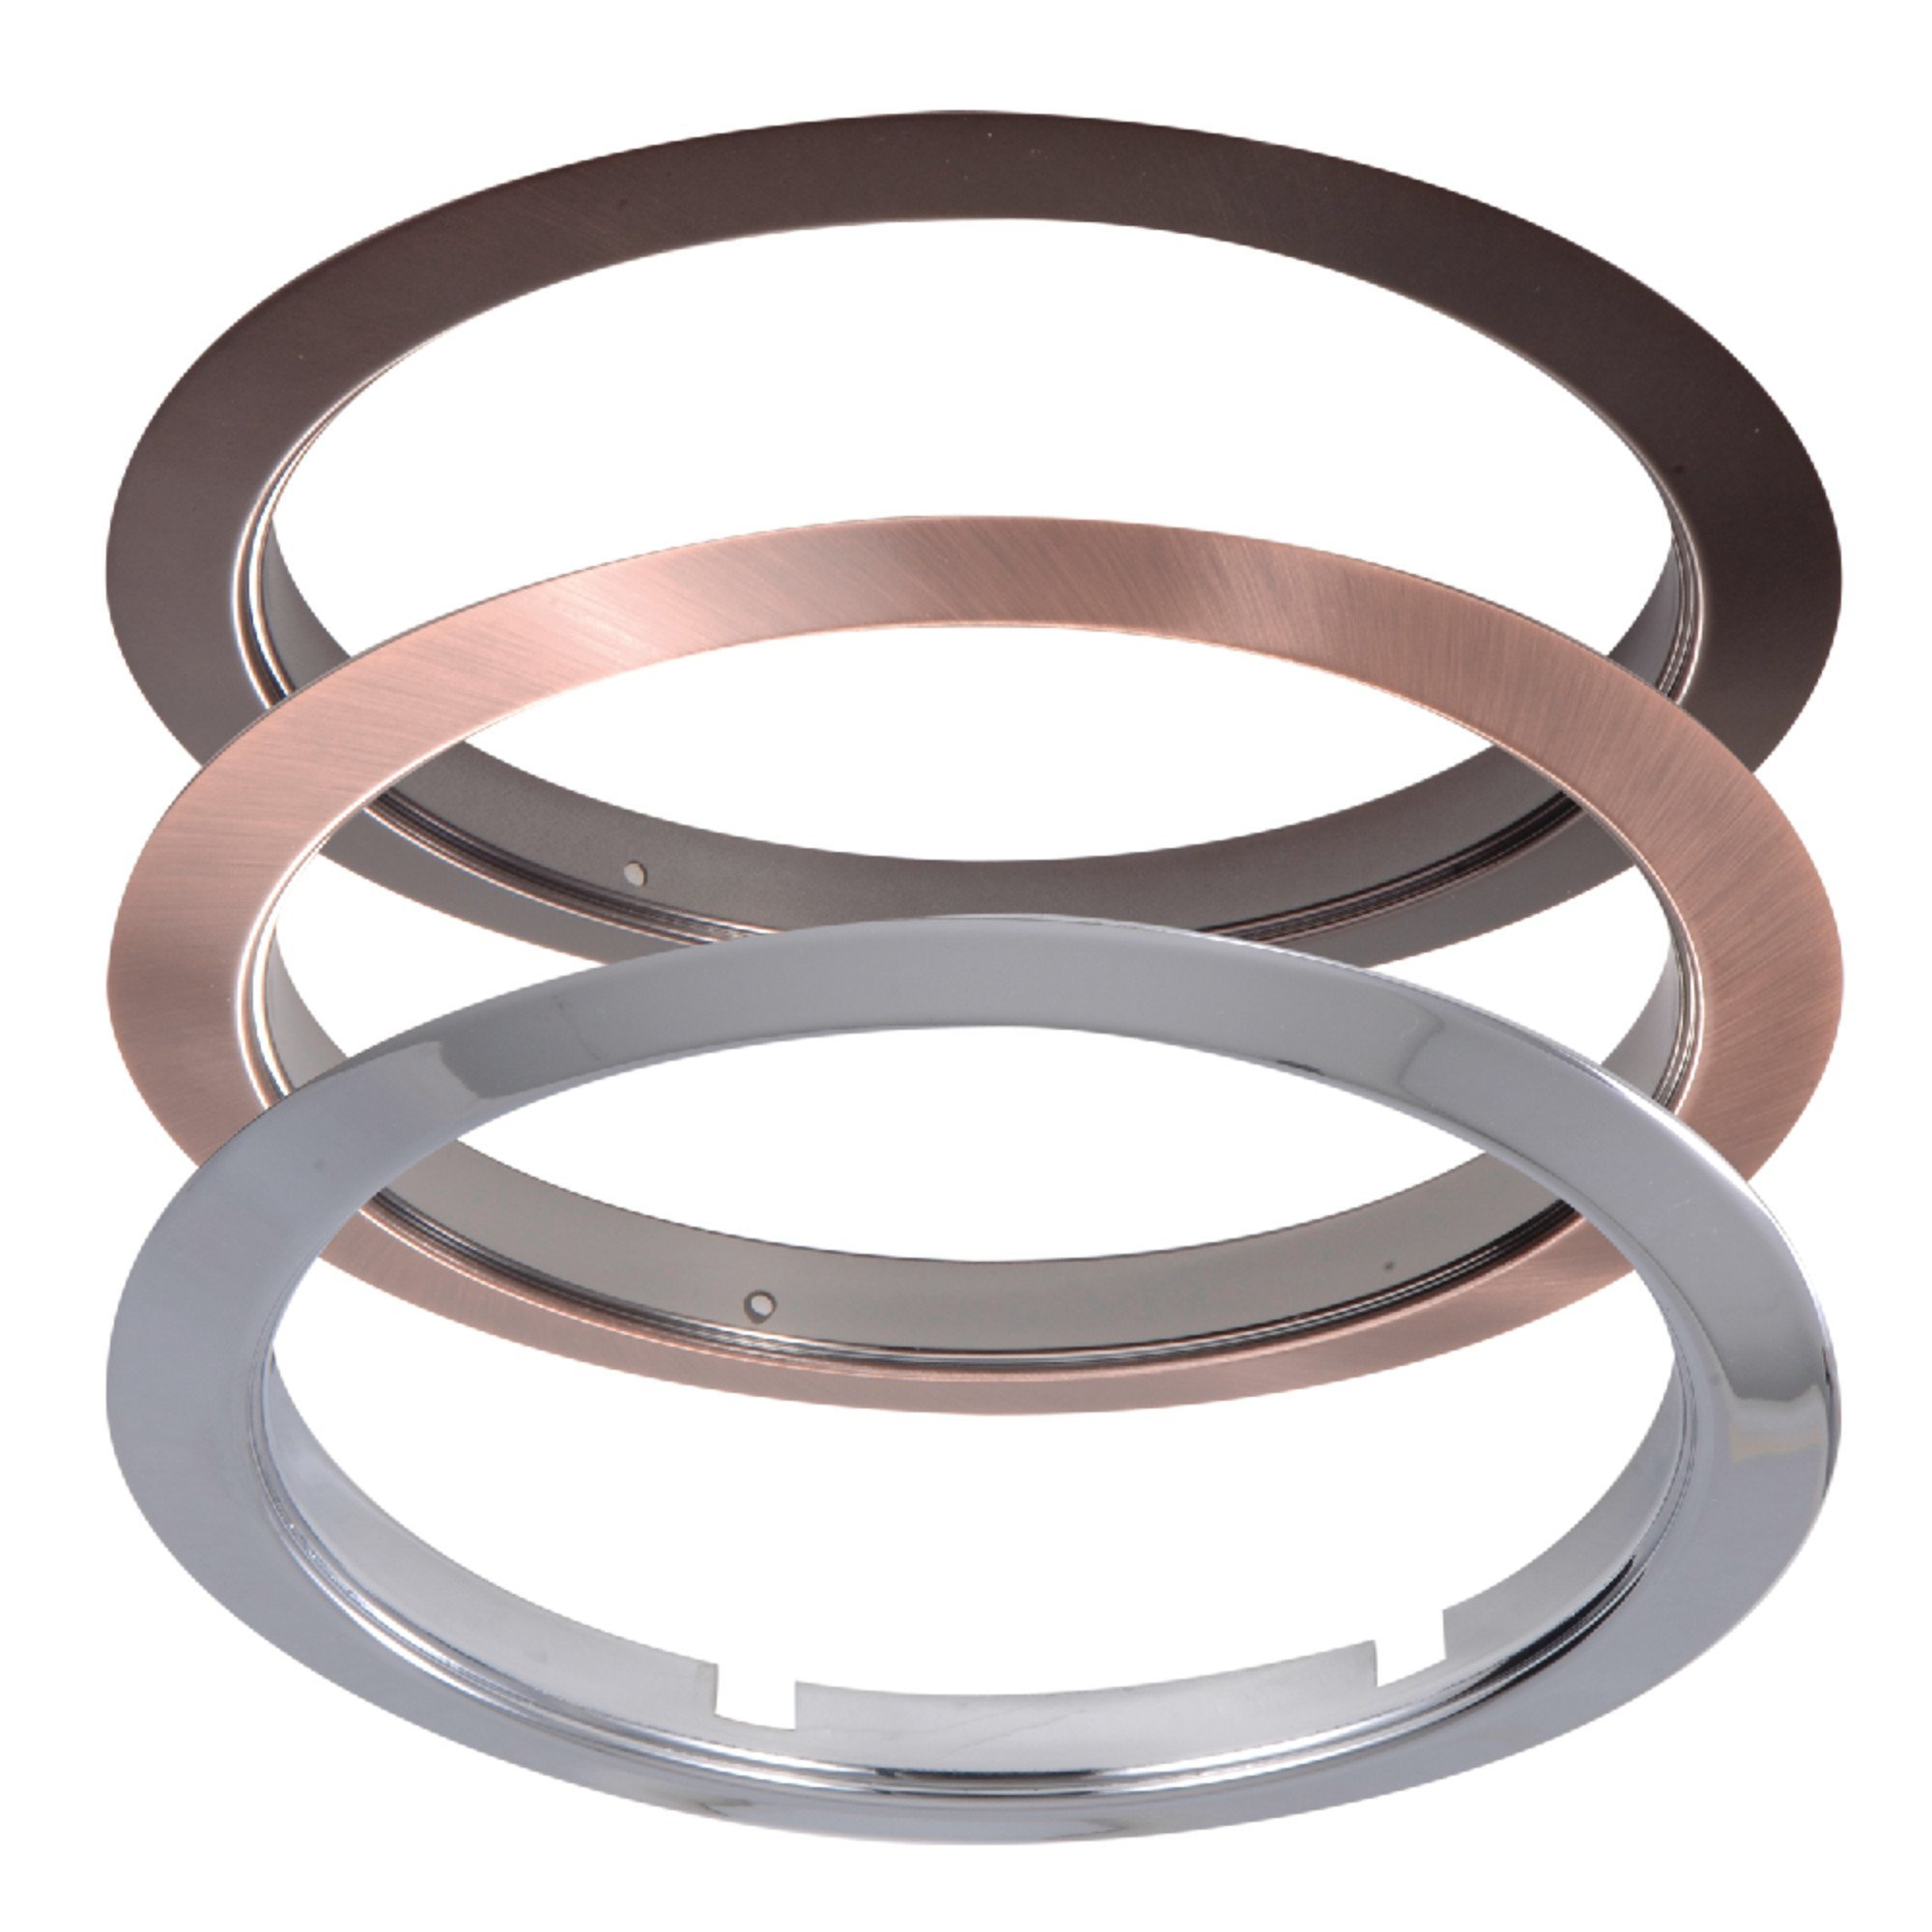 Halo TRM6TBZ Trim Ring, 6'' Metal, Tuscan Bronze by Halo